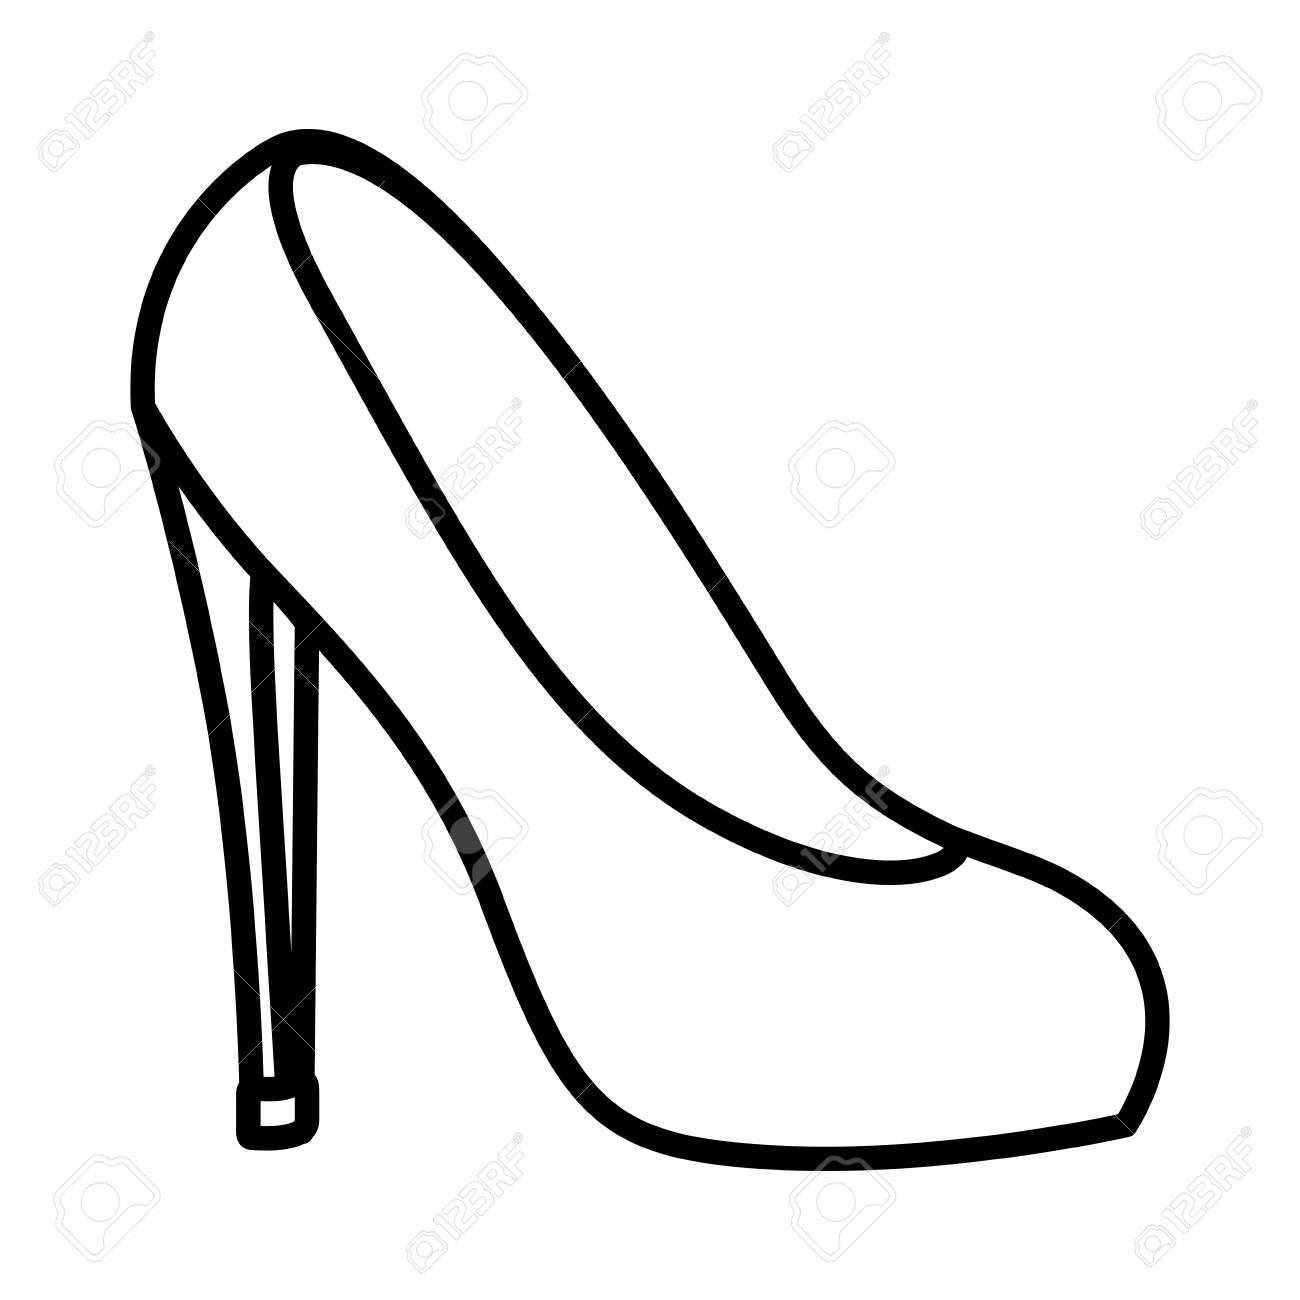 High Heel Shoe Pop Art Icon Vector Illustration Design Royalty Free